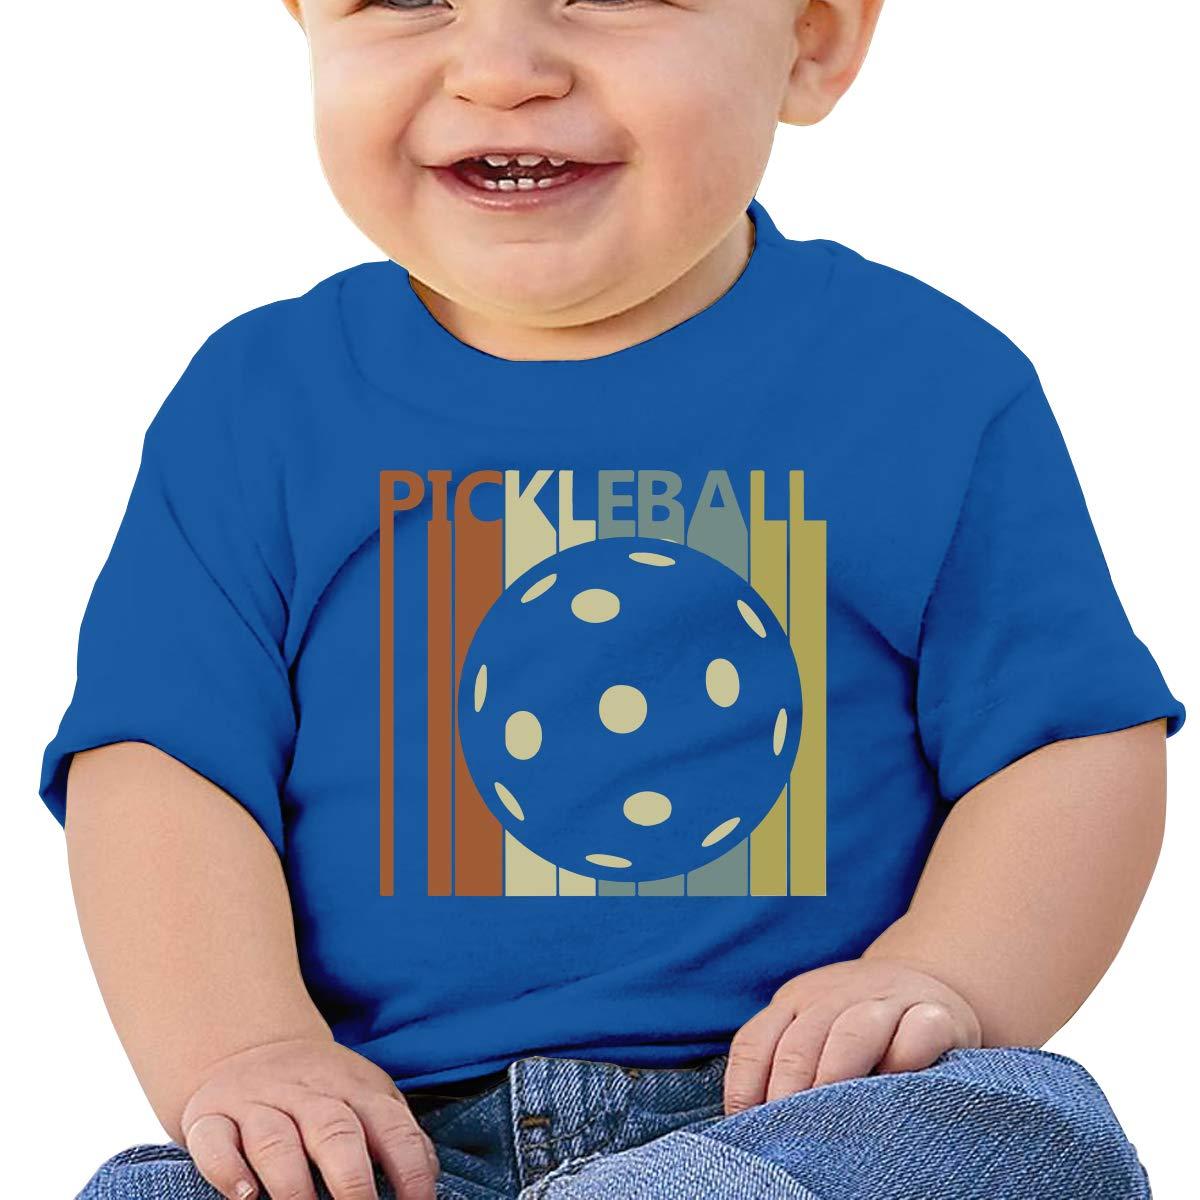 XHX403 Vintage Retro Pickleball Infant Kids T Shirt Cotton Tee Toddler Baby 6-18M